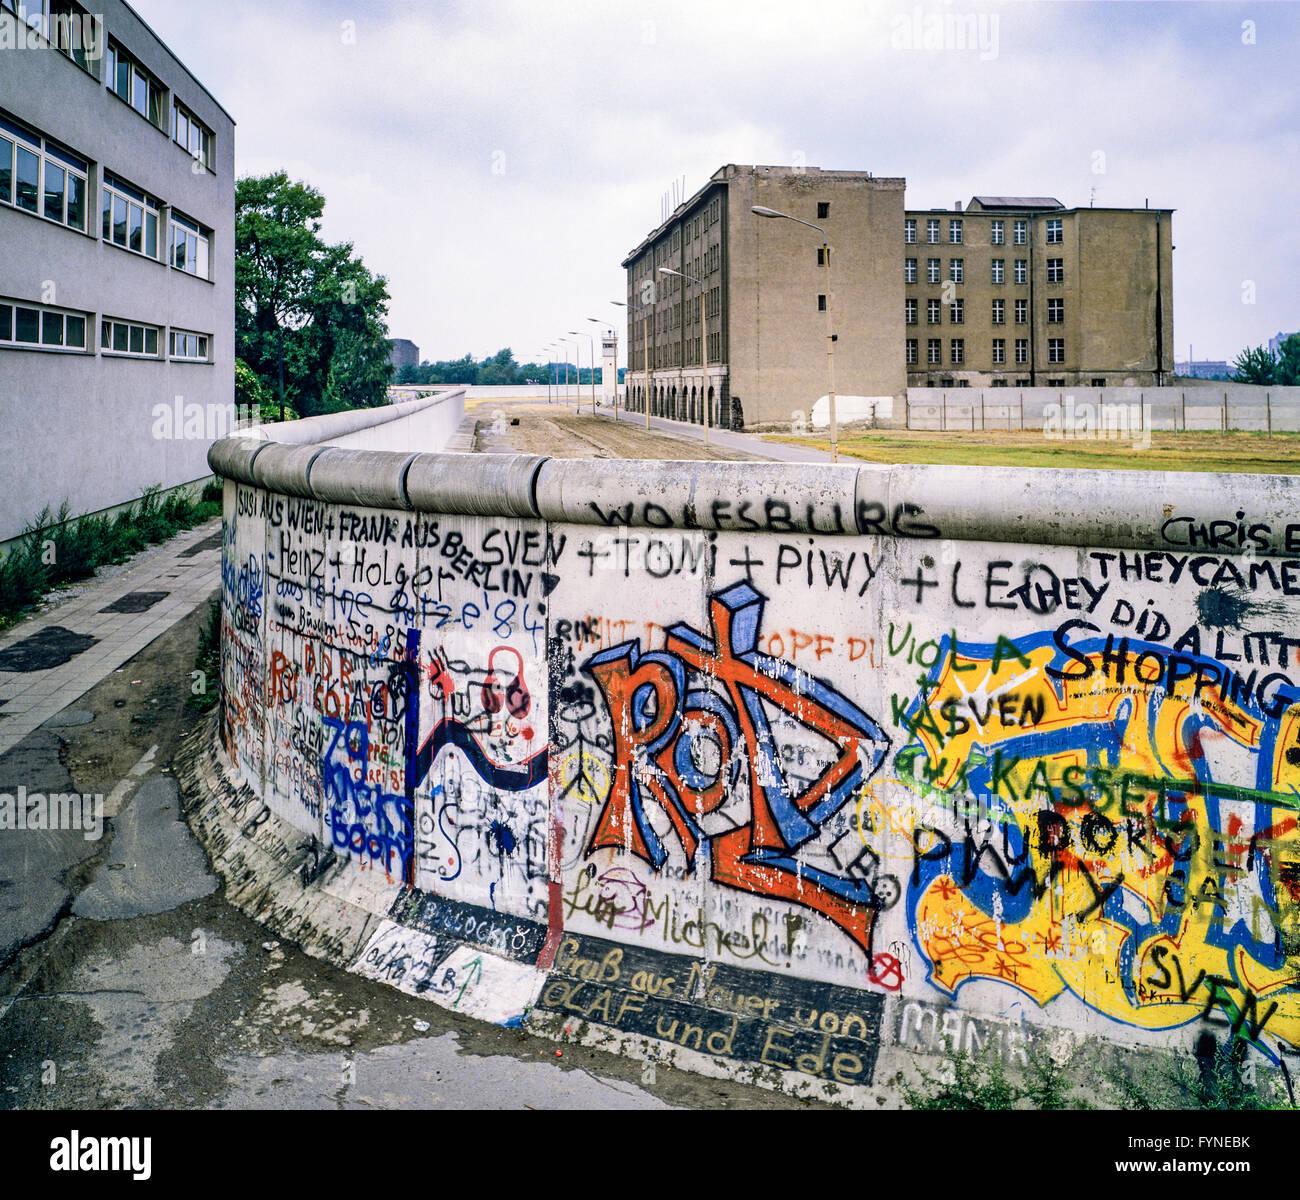 August 1986, Berlin Wall graffitis, death strip zone, East Berlin buildings, West Berlin side, Germany, Europe, - Stock Image